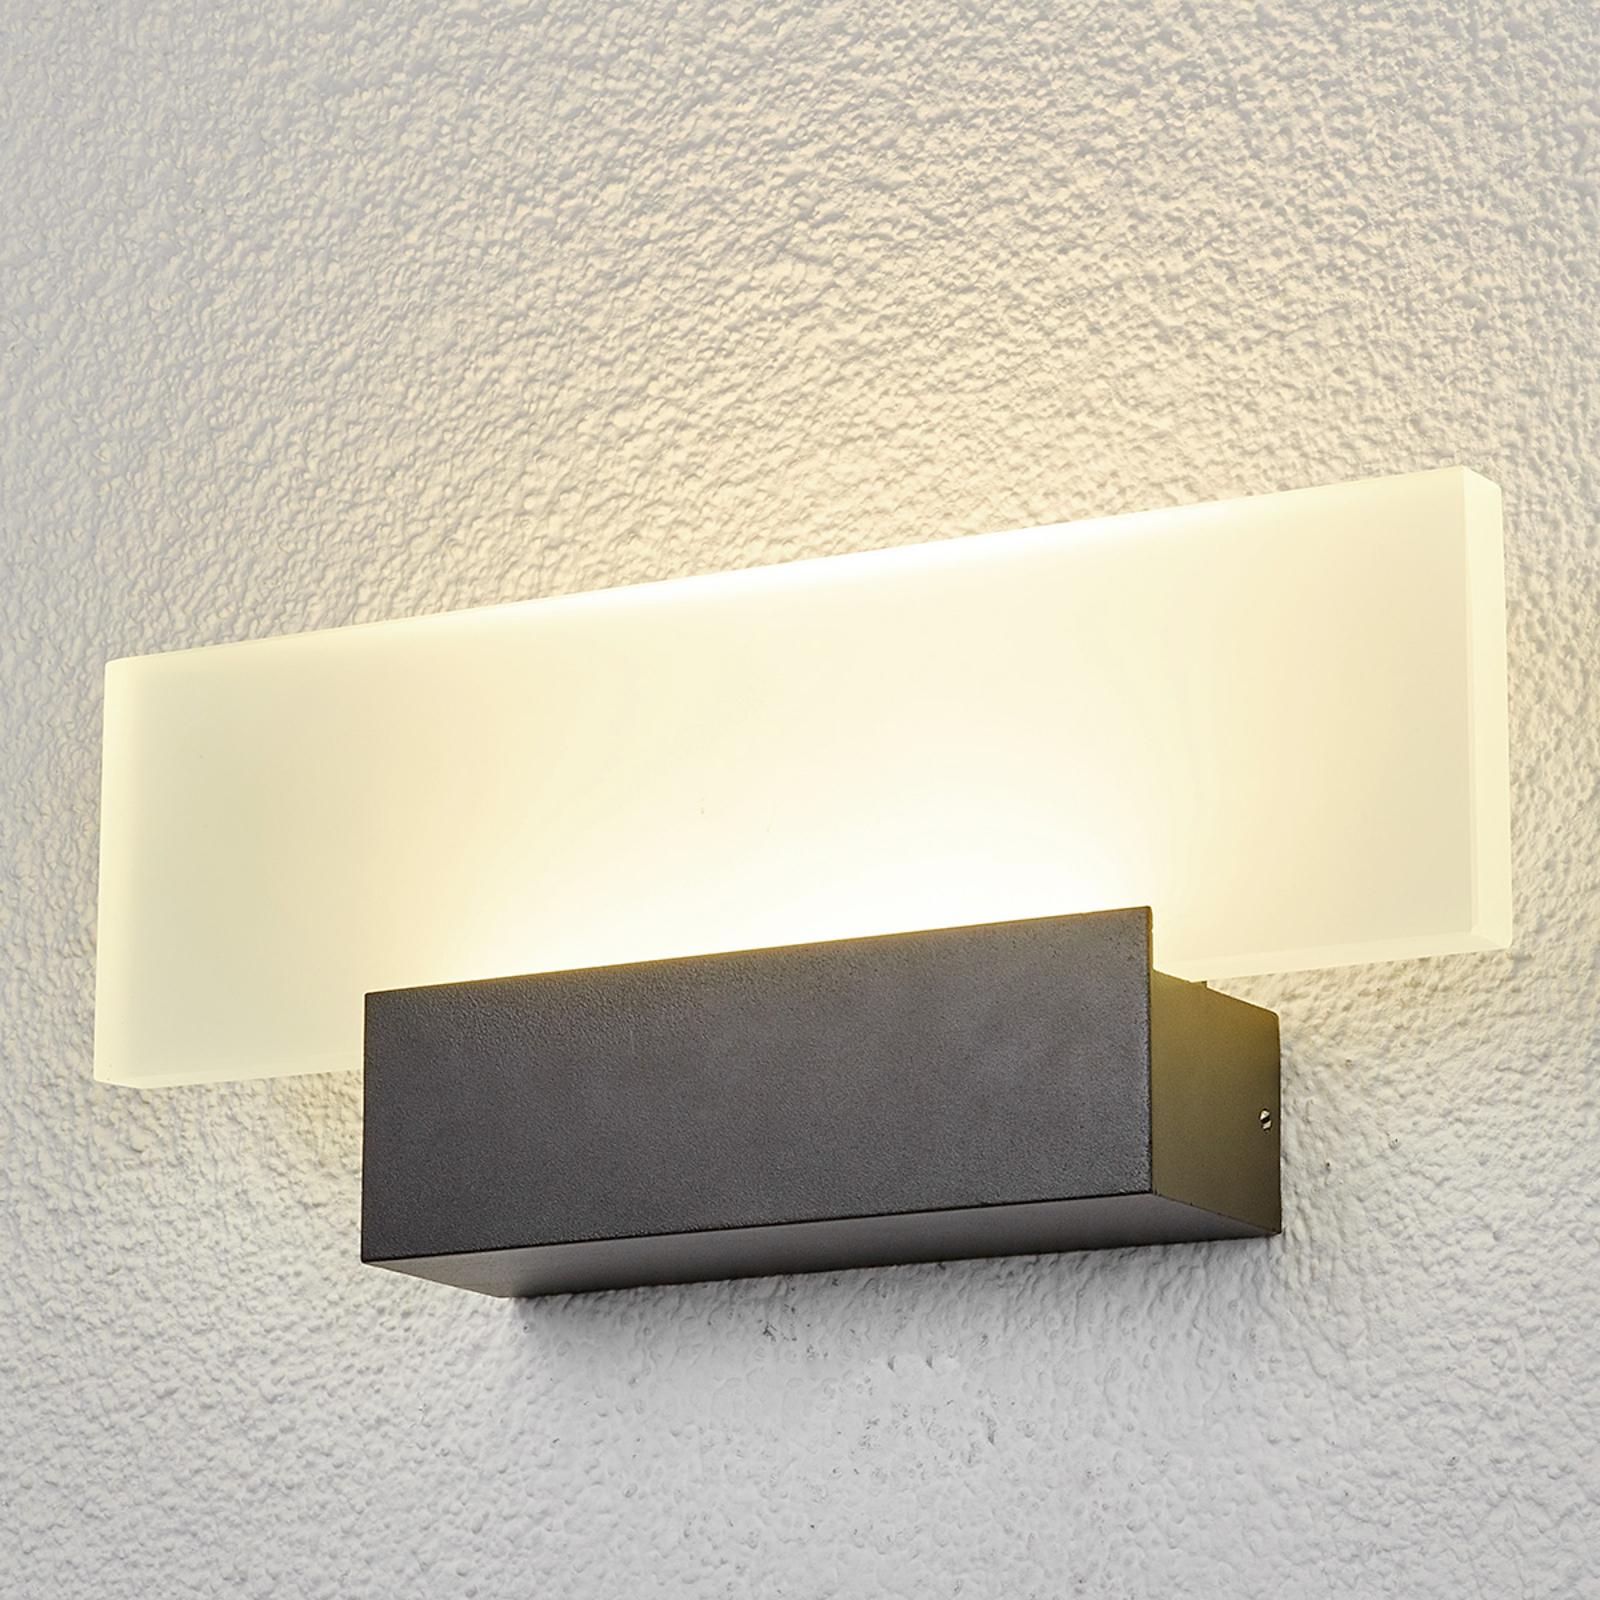 LED-ulkoseinälamppu Rieke